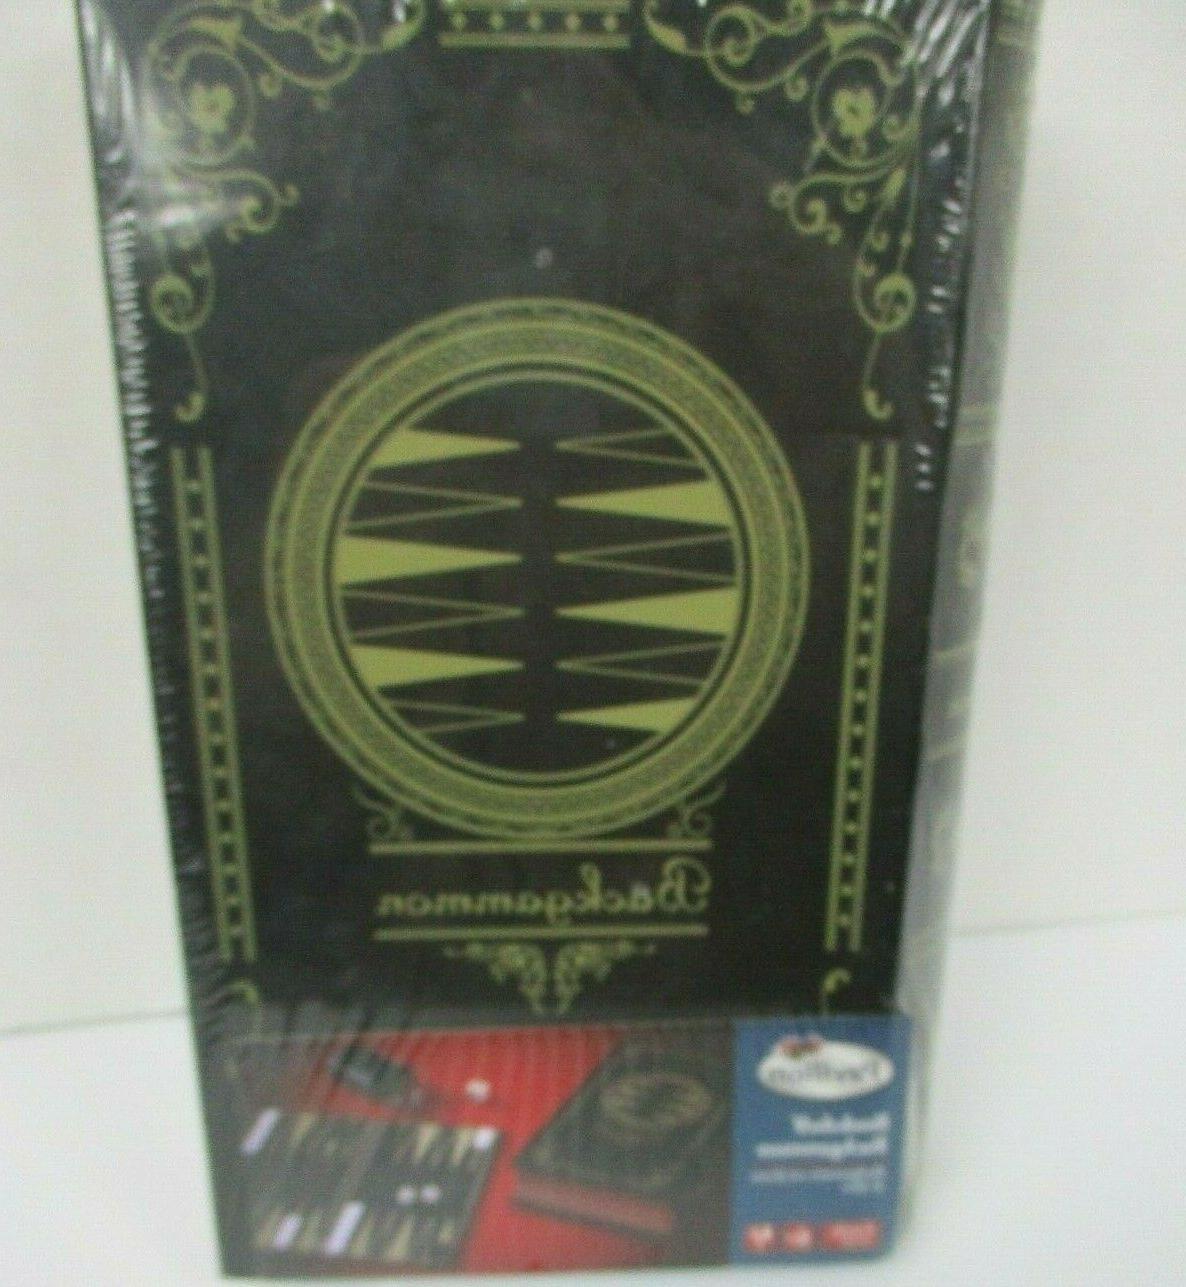 bookshelf backgammon game in book case toys